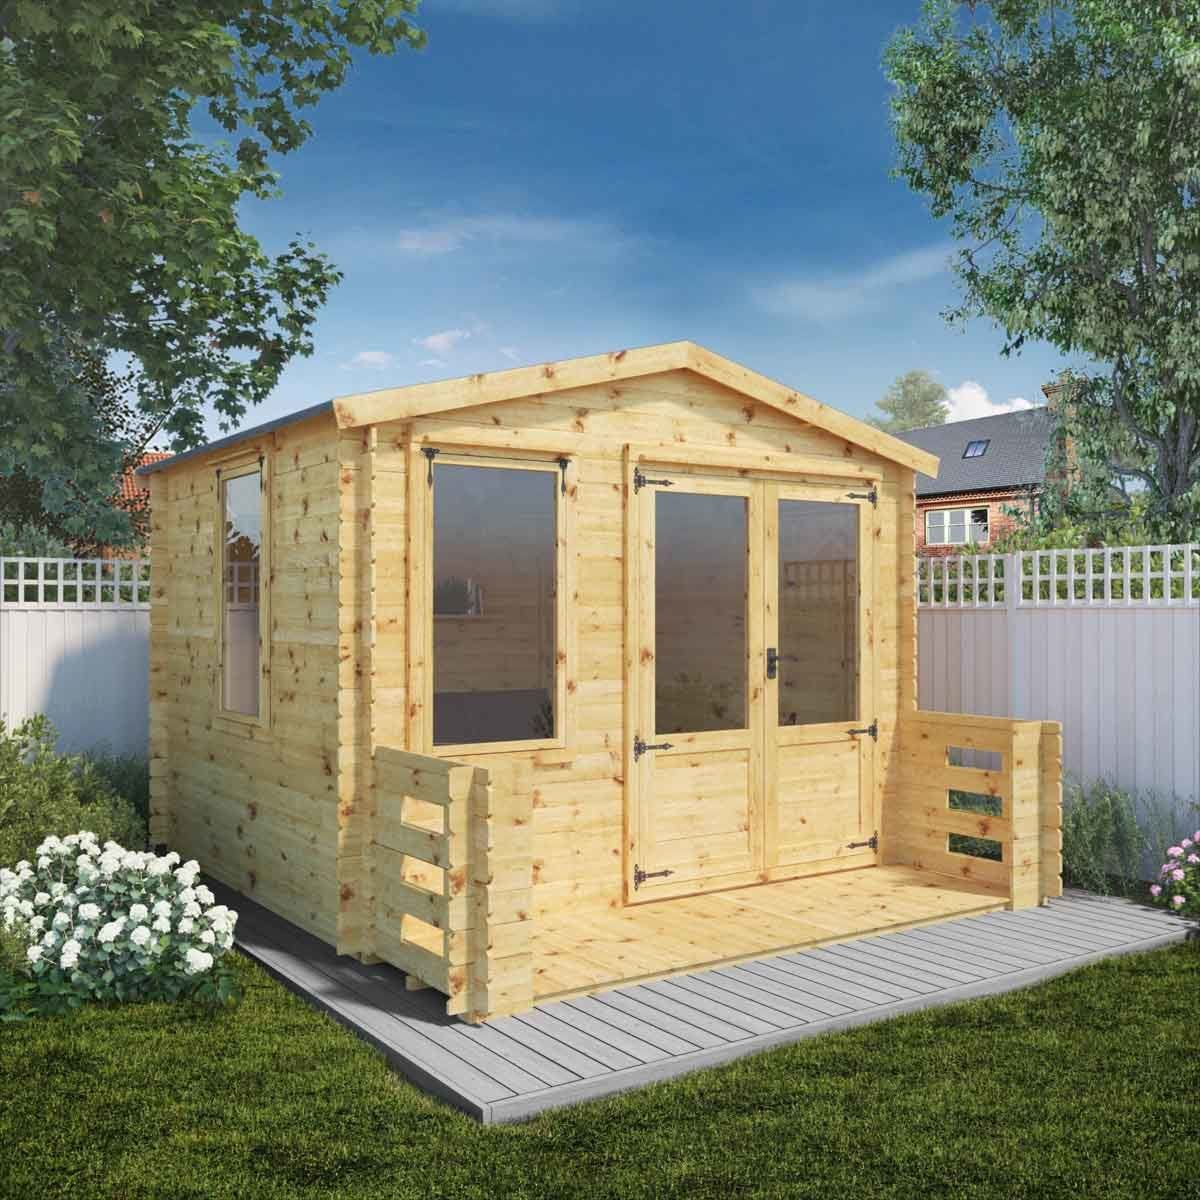 Mercia 19mm Log Cabin with Veranda - 3.3 x 3.7m